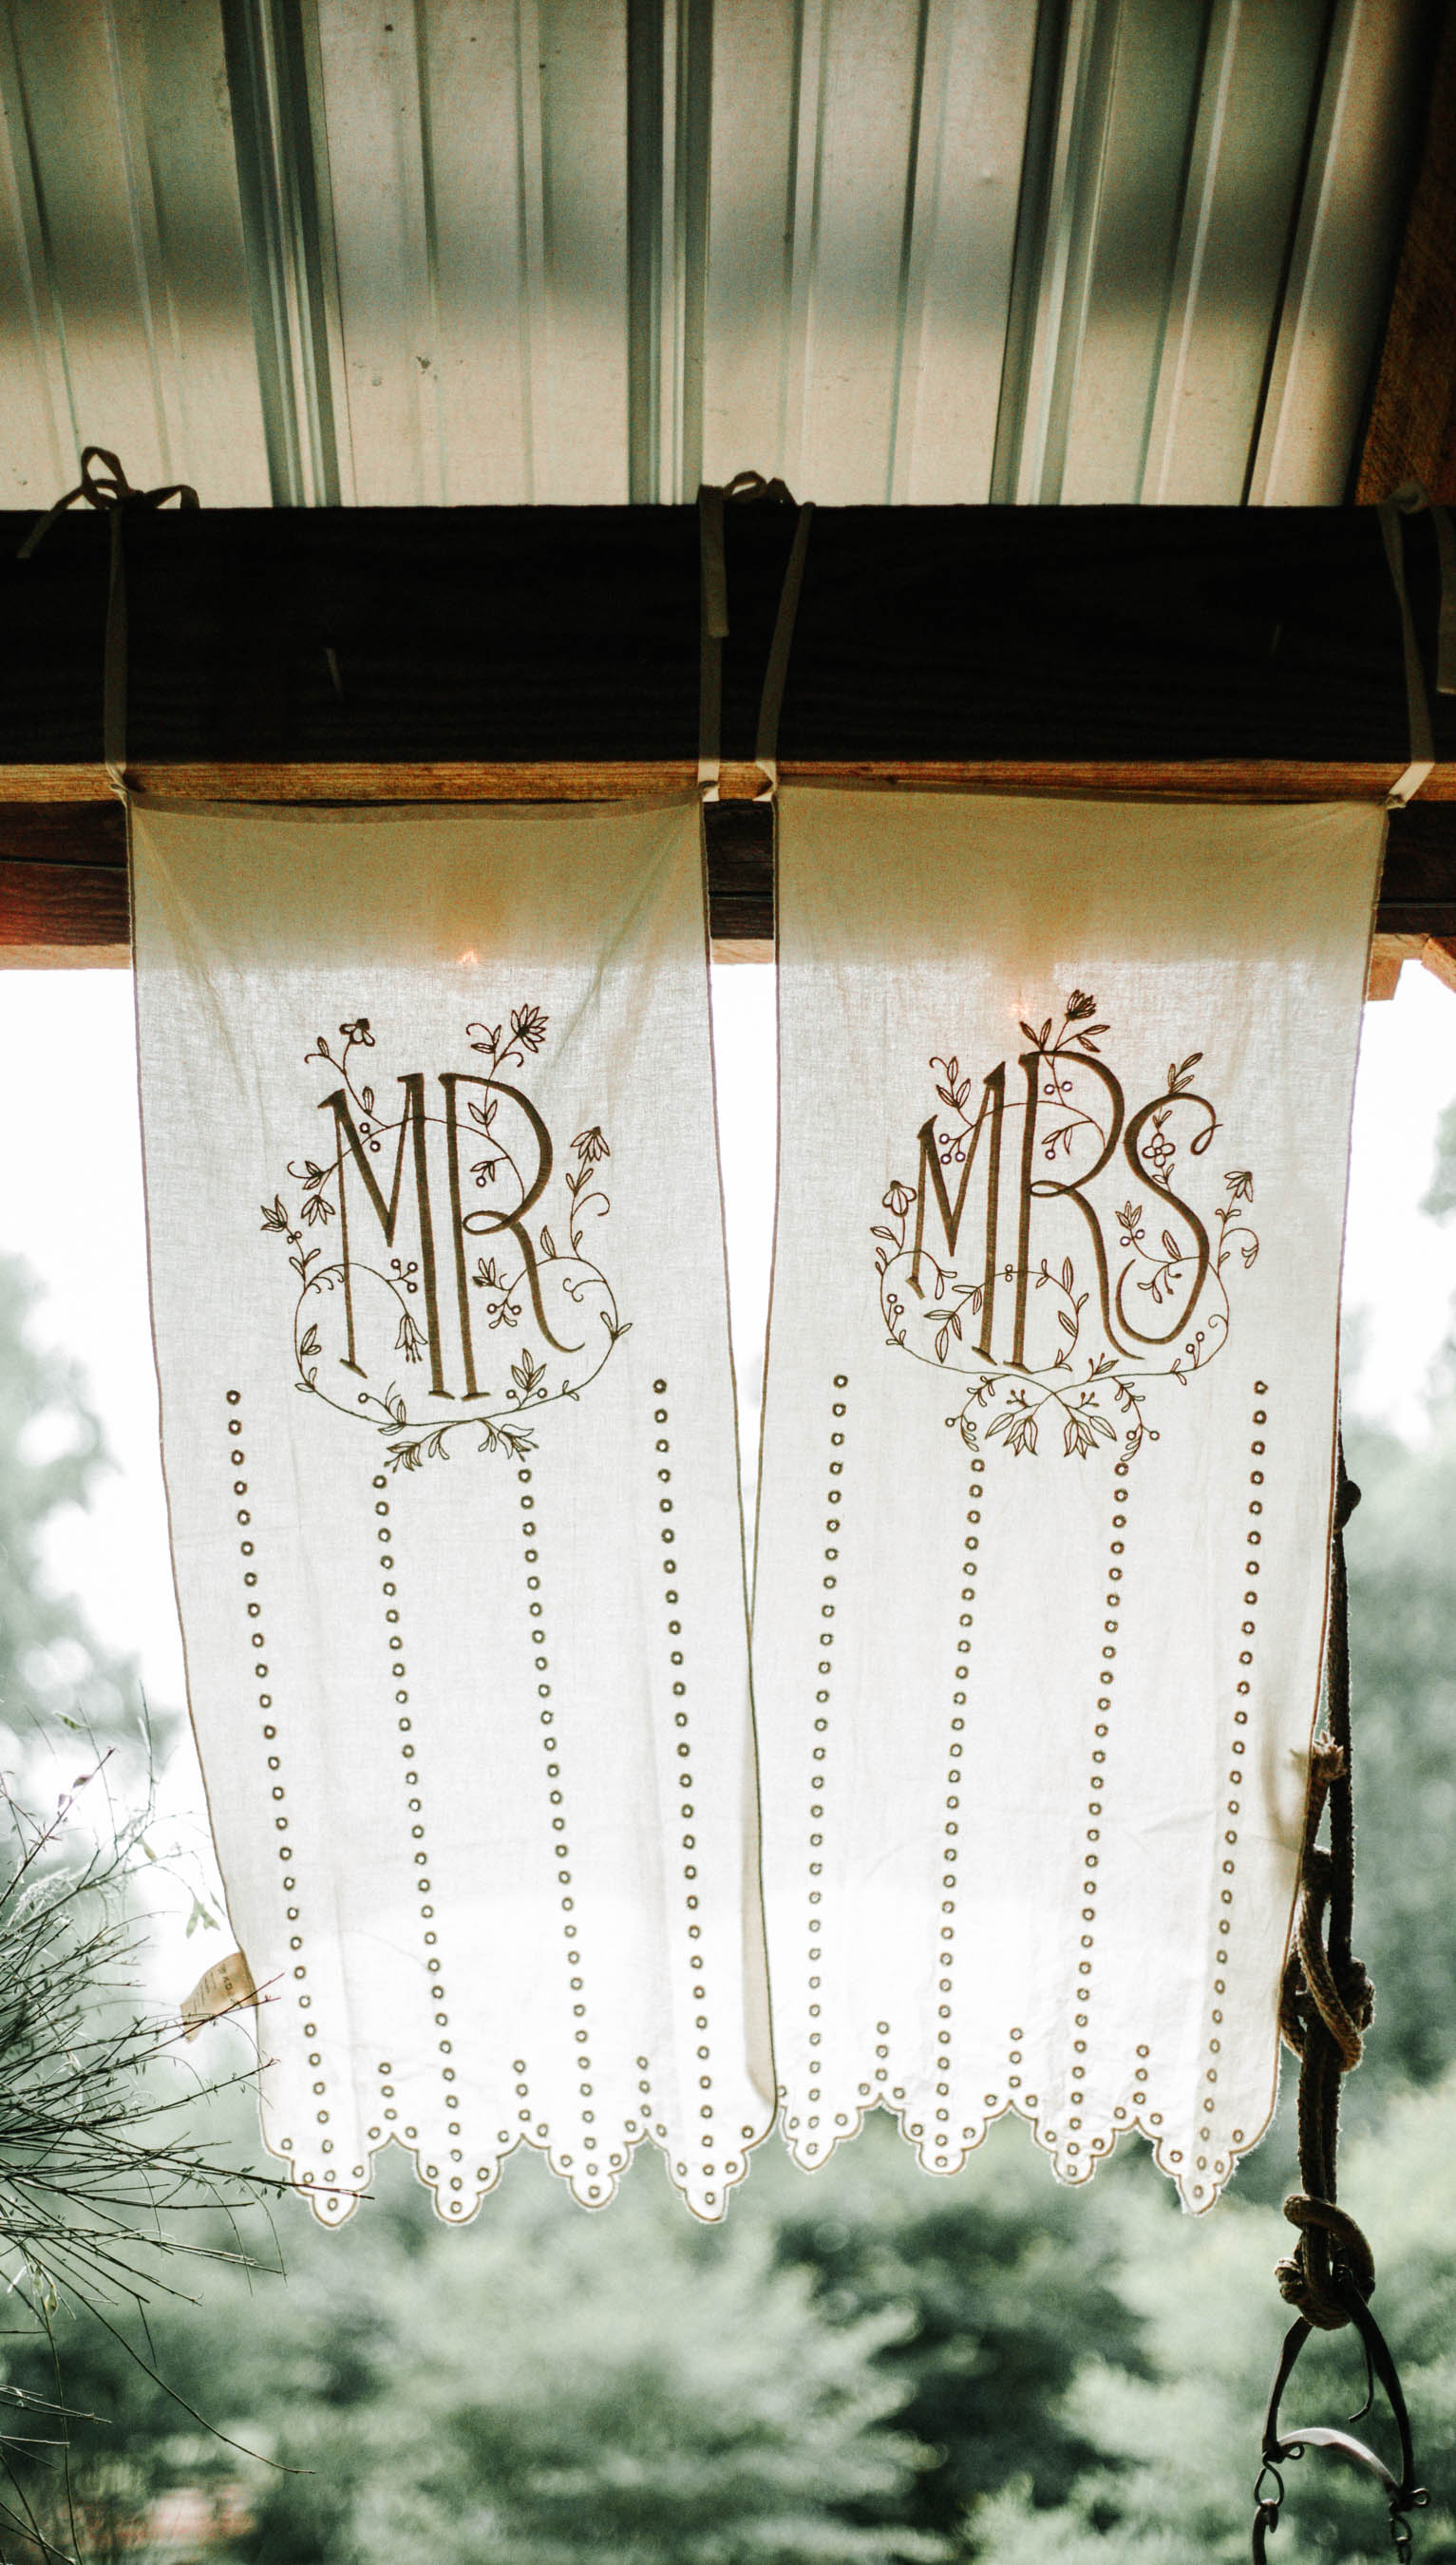 neverland-farms-wedding-venue.jpg